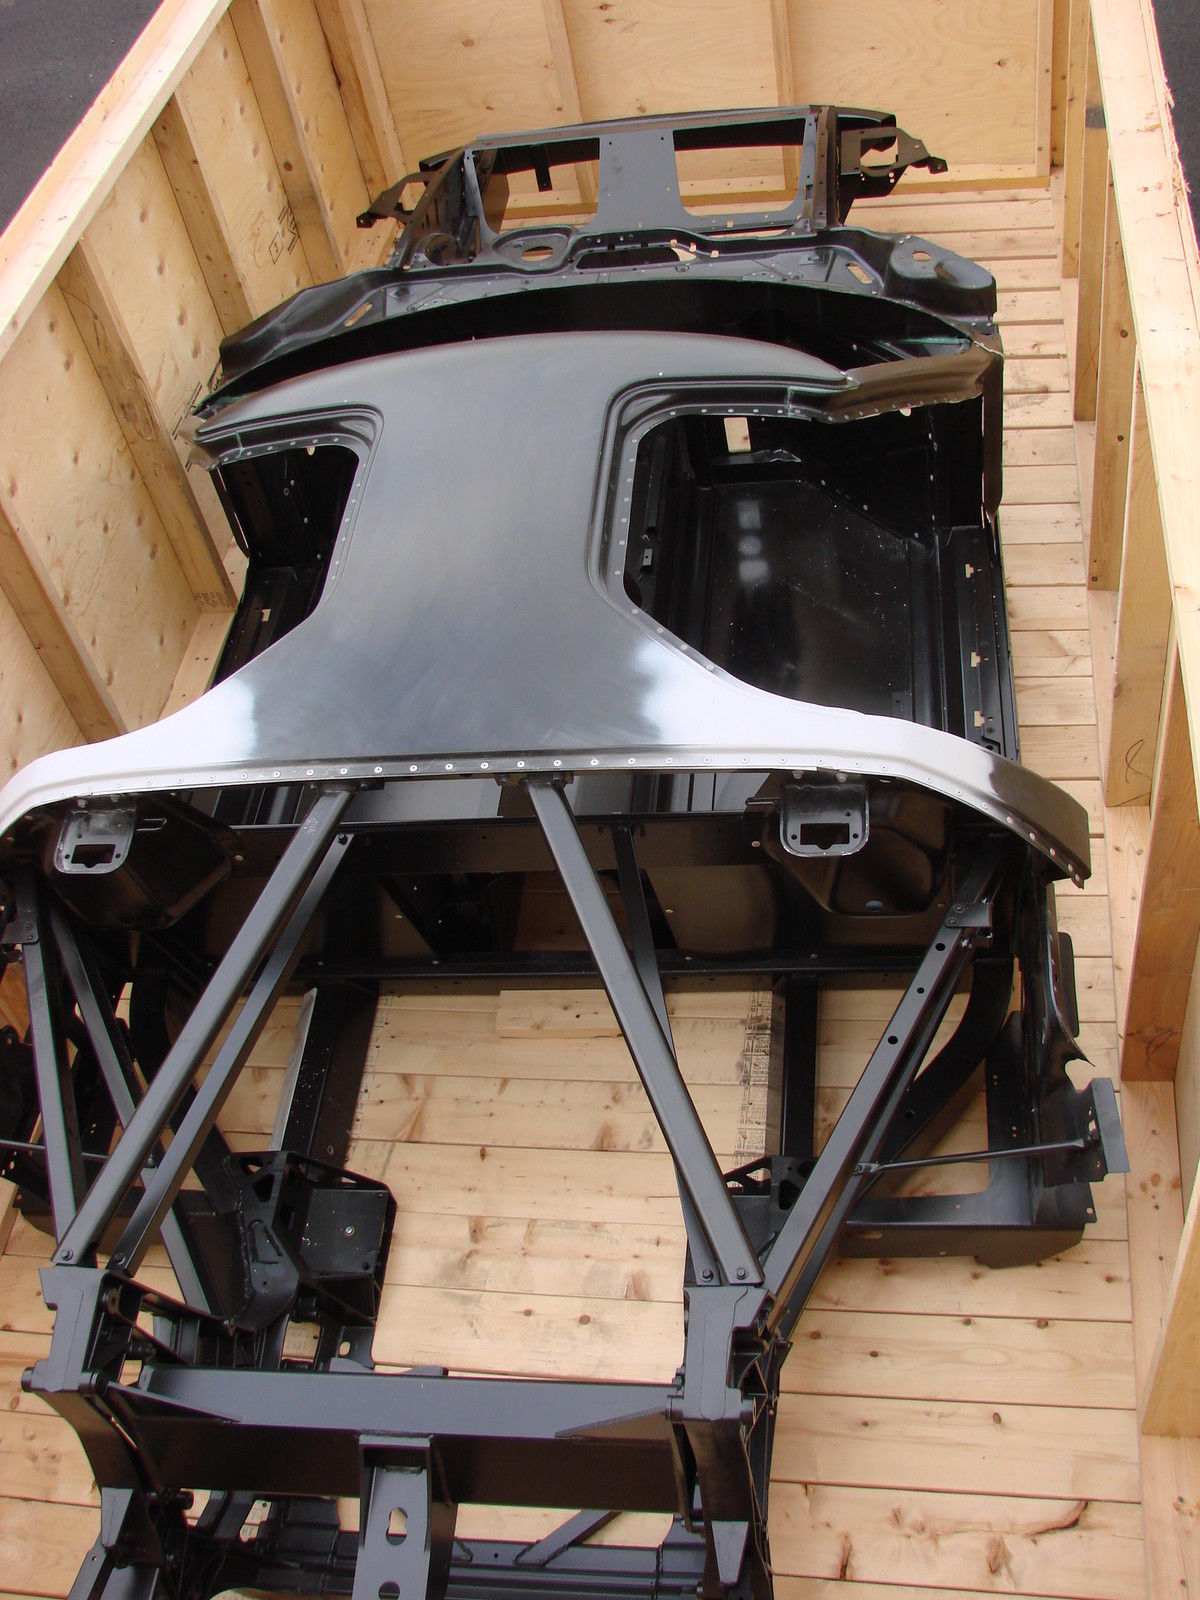 BangShift.com 2006 ford gt chassis